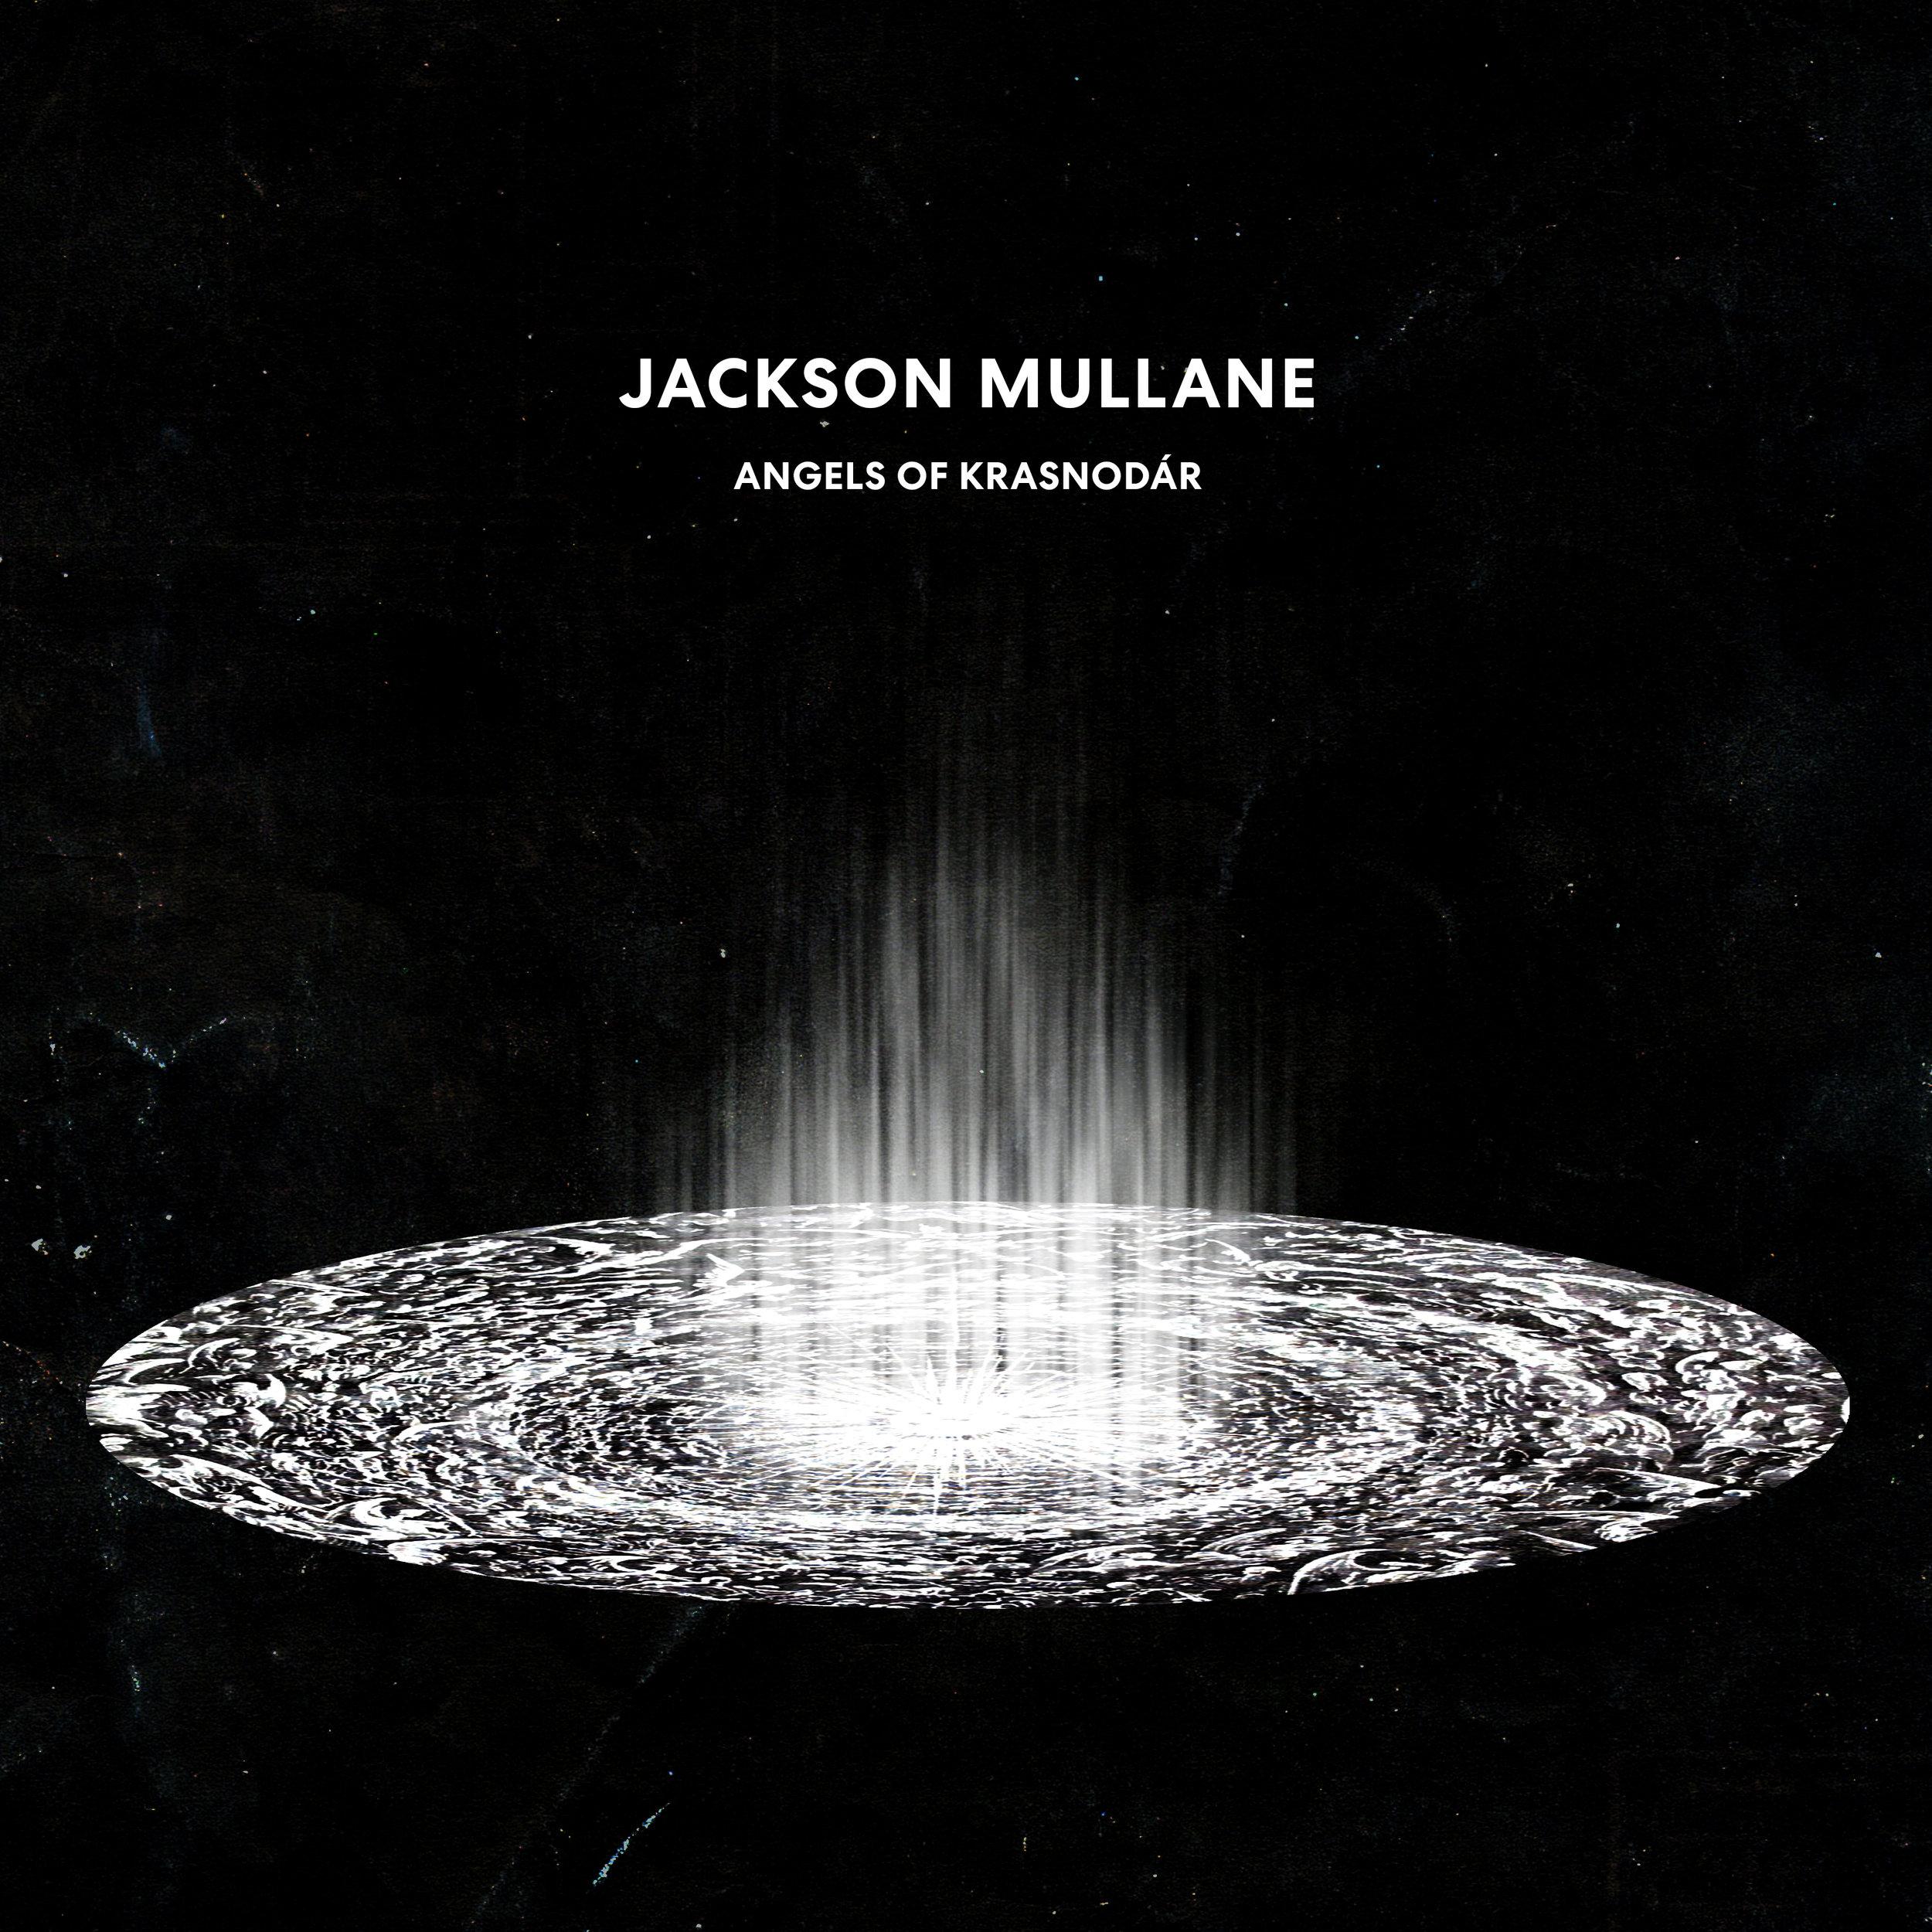 JacksonMullaneIntotheAbyssFullLayers-Recovered copy.jpg